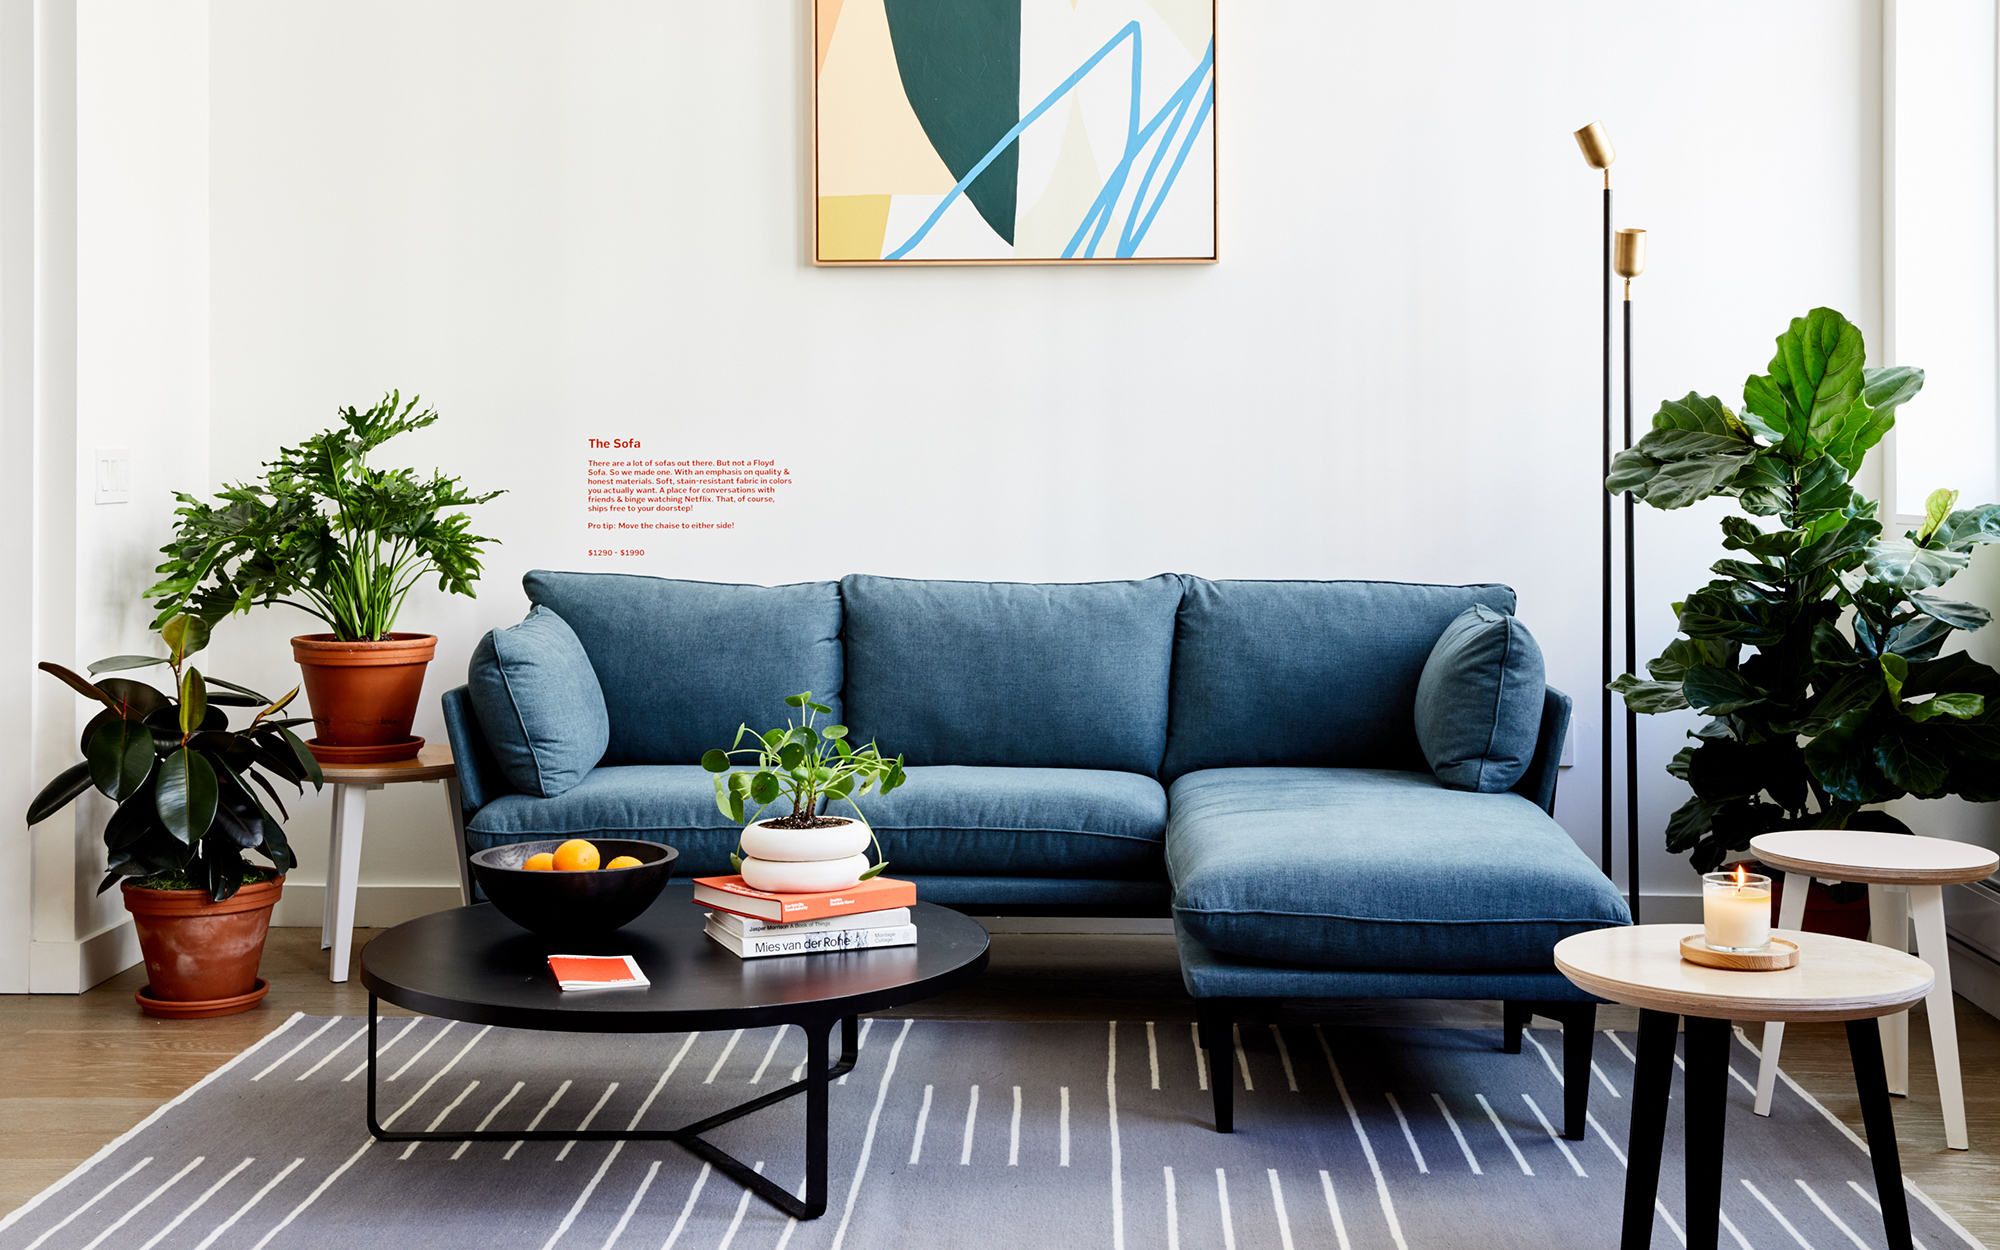 StephanieTam_Floyd-Housewarming-NYC_LivingRoom-Sofa.jpg